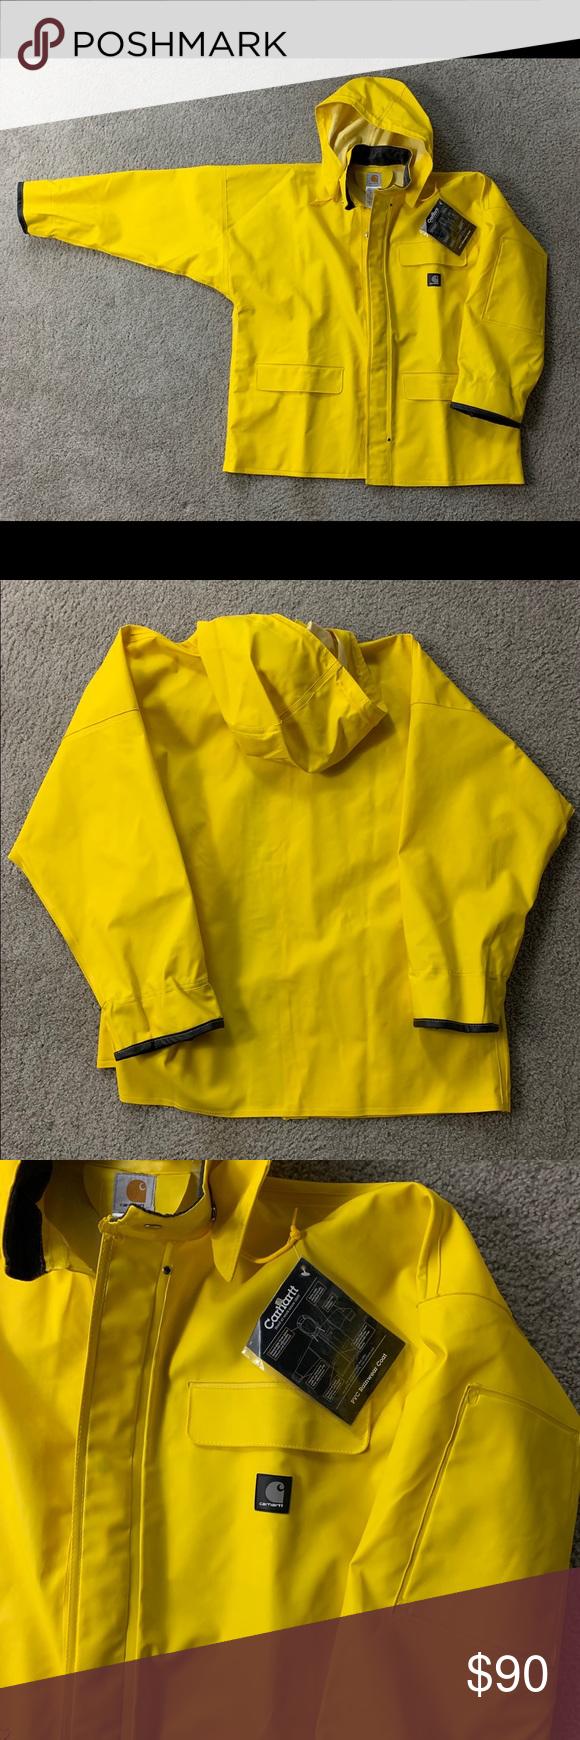 9583f62a3 Carhartt C64 YLW Yellow PVC Raincoat Jacket Sz L Carhartt C64 YLW Yellow  PVC Raincoat Jacket